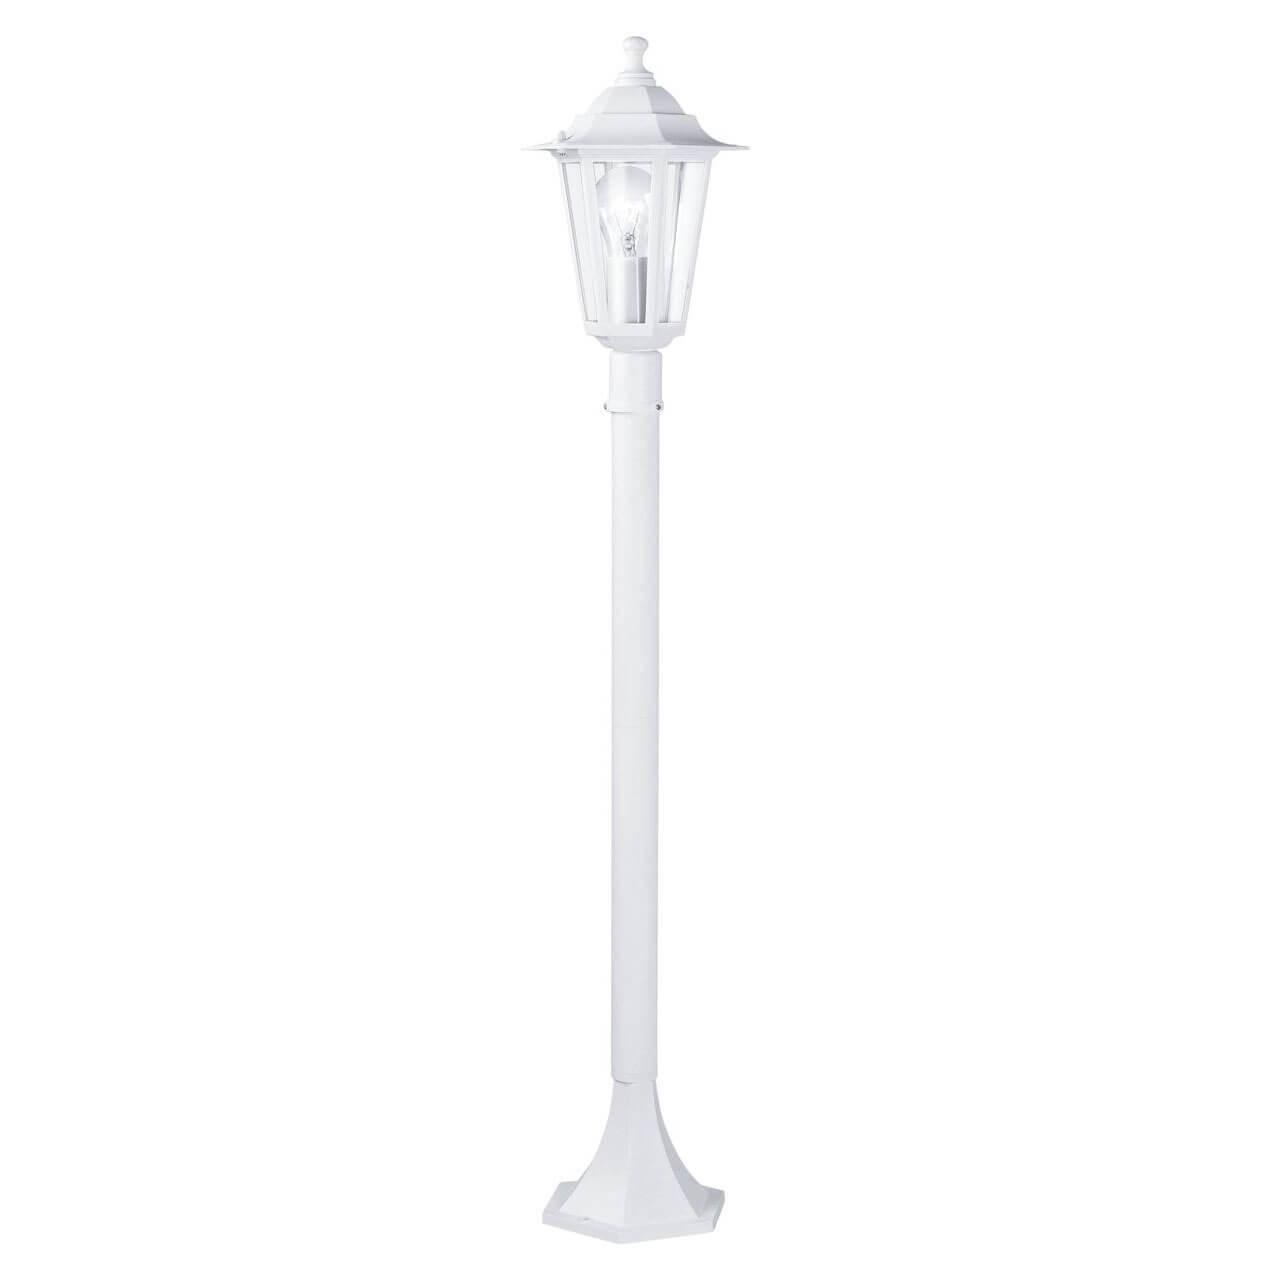 Уличный светильник Eglo 22995, E27 eglo 93118